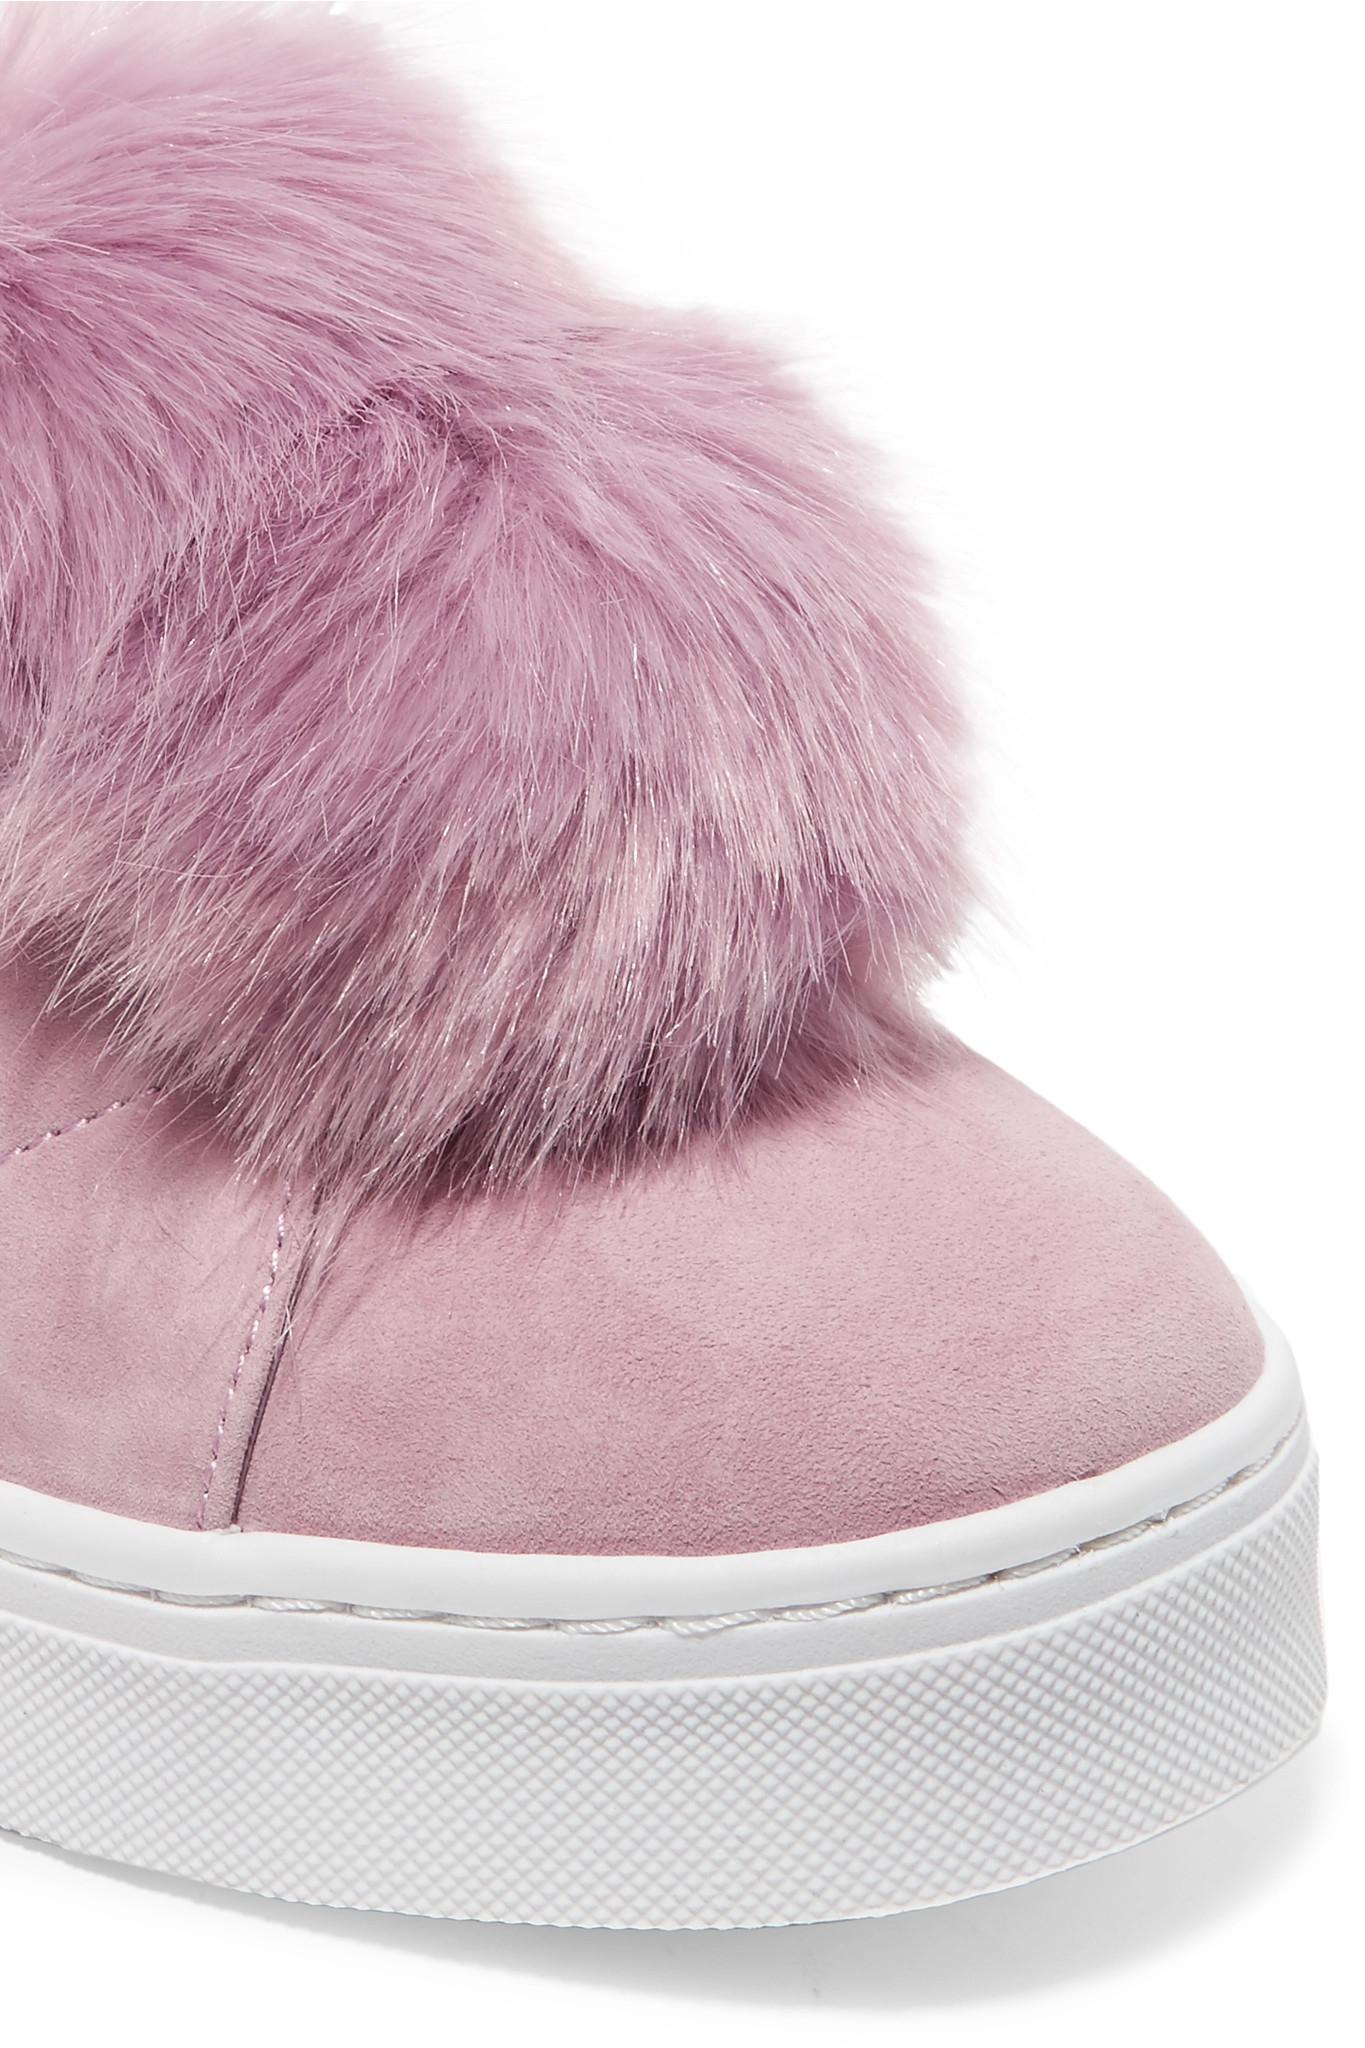 86ba4363daf791 Lyst - Sam Edelman Leya Faux Fur-embellished Suede Slip-on Sneakers